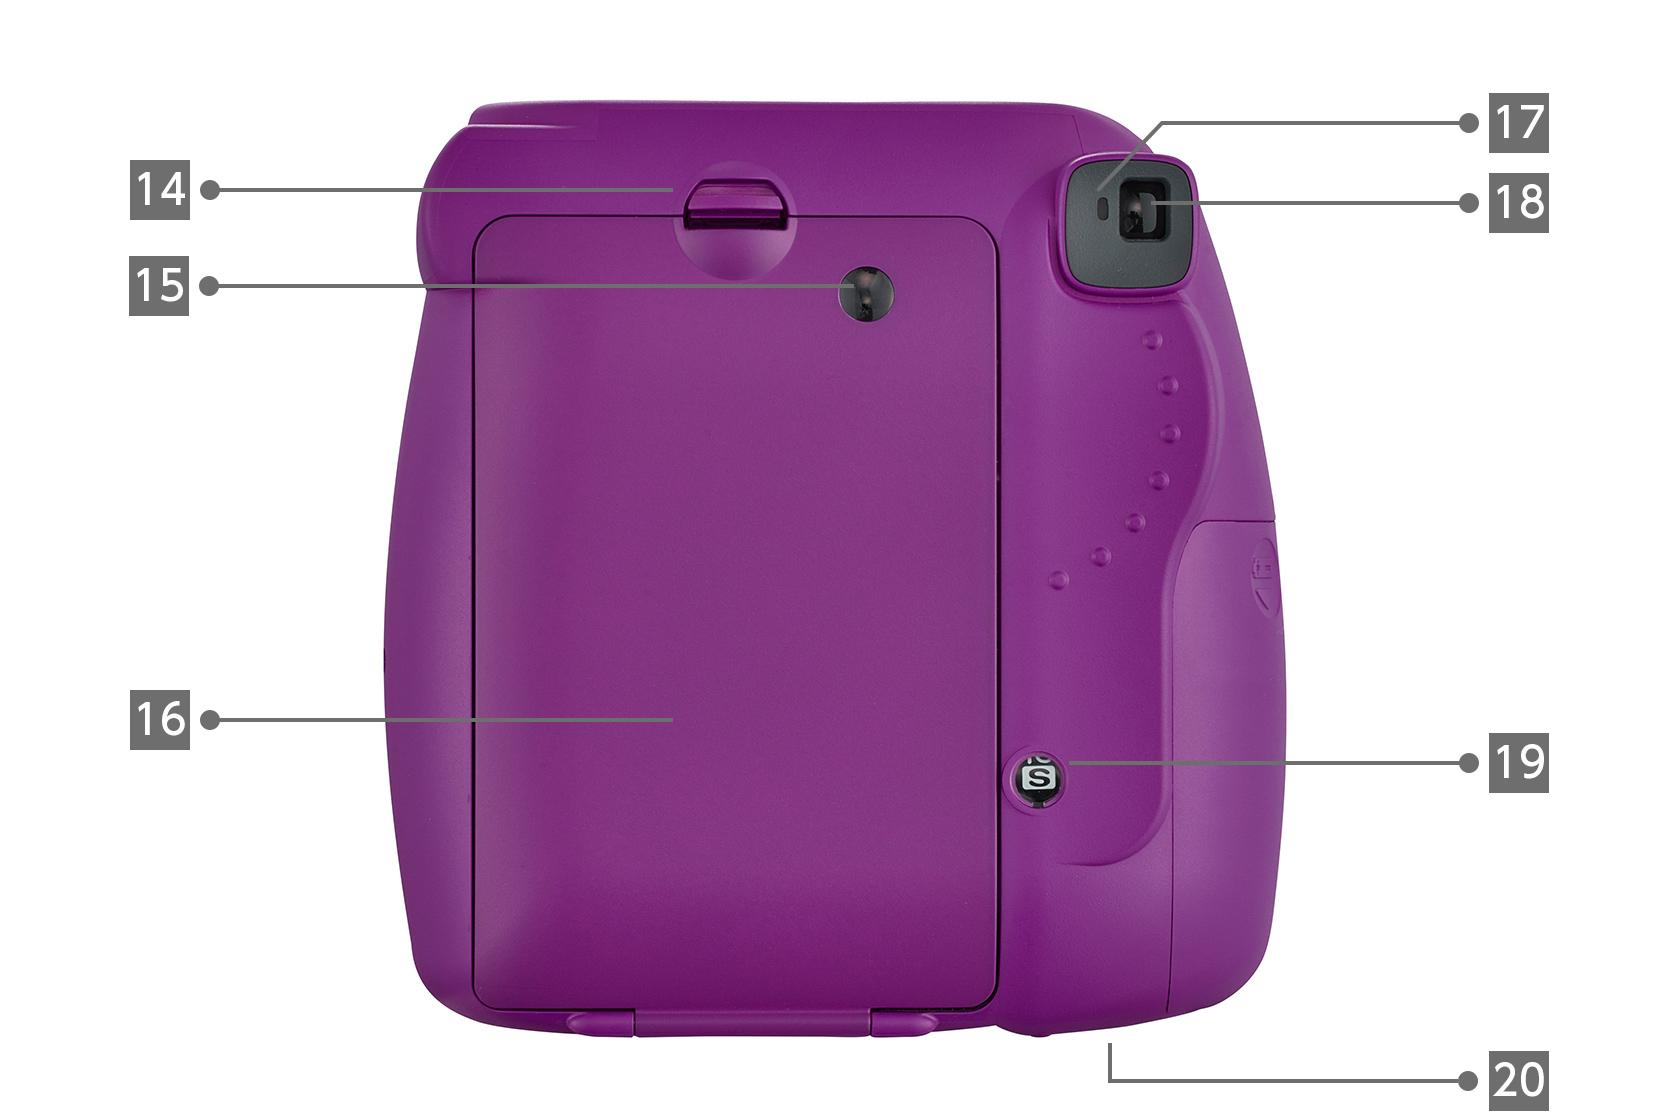 Black view purple mini 9 limited edition INSTAX camera